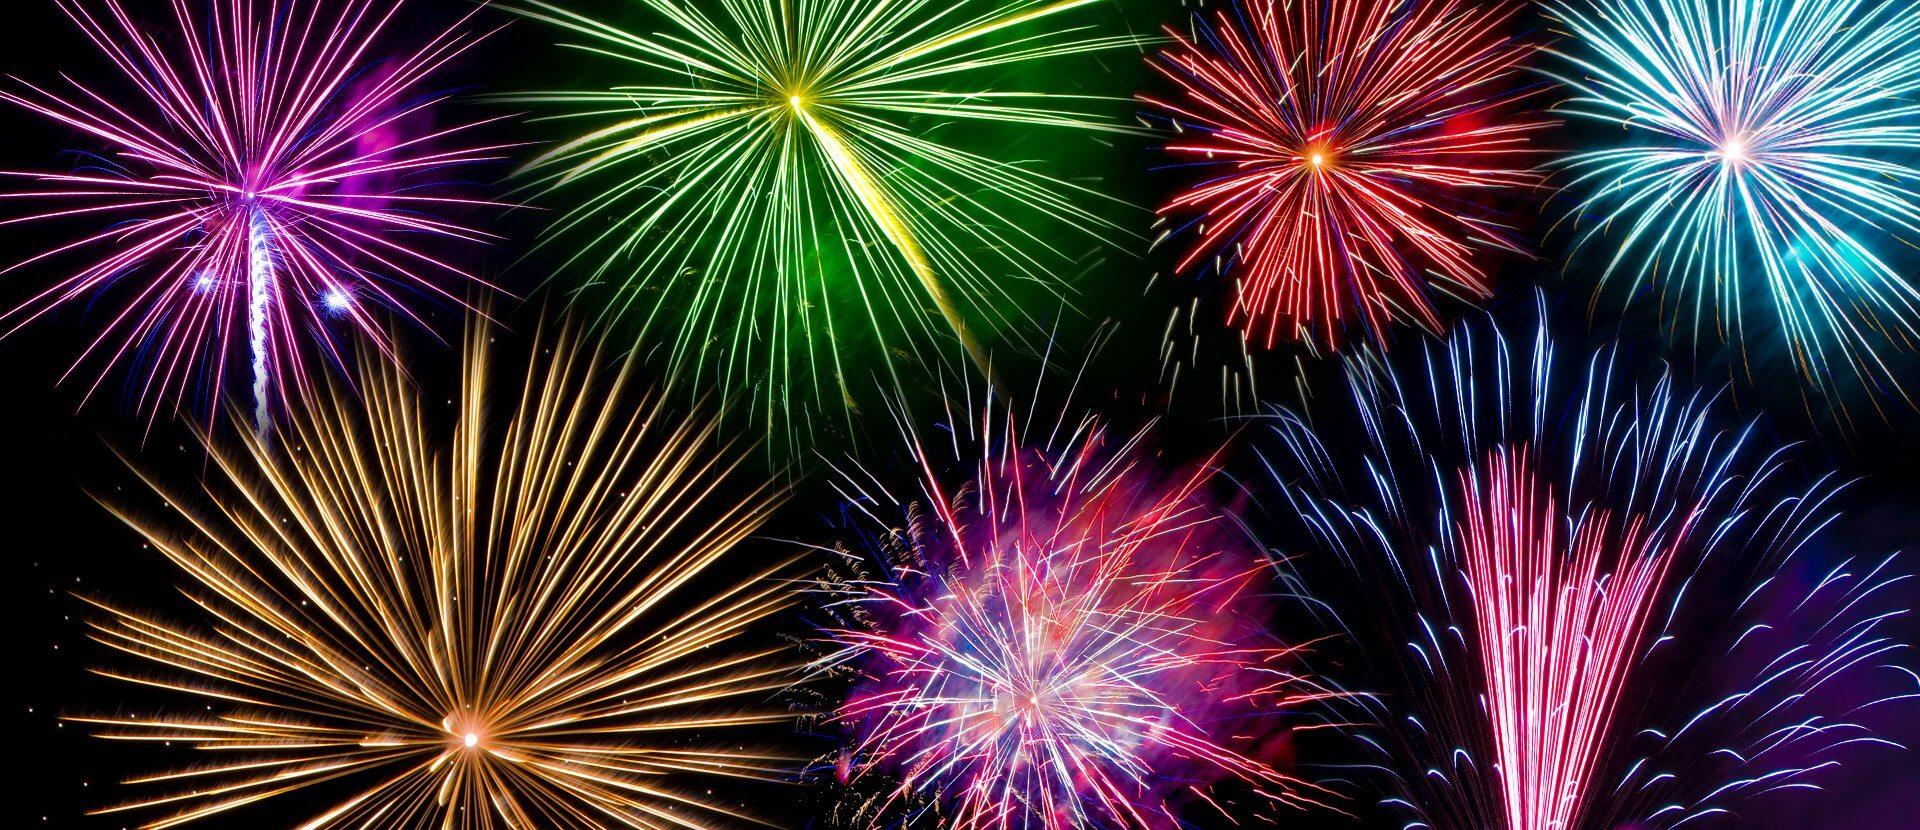 fireworks, night sky, colorful, purple, green, yellow, blue